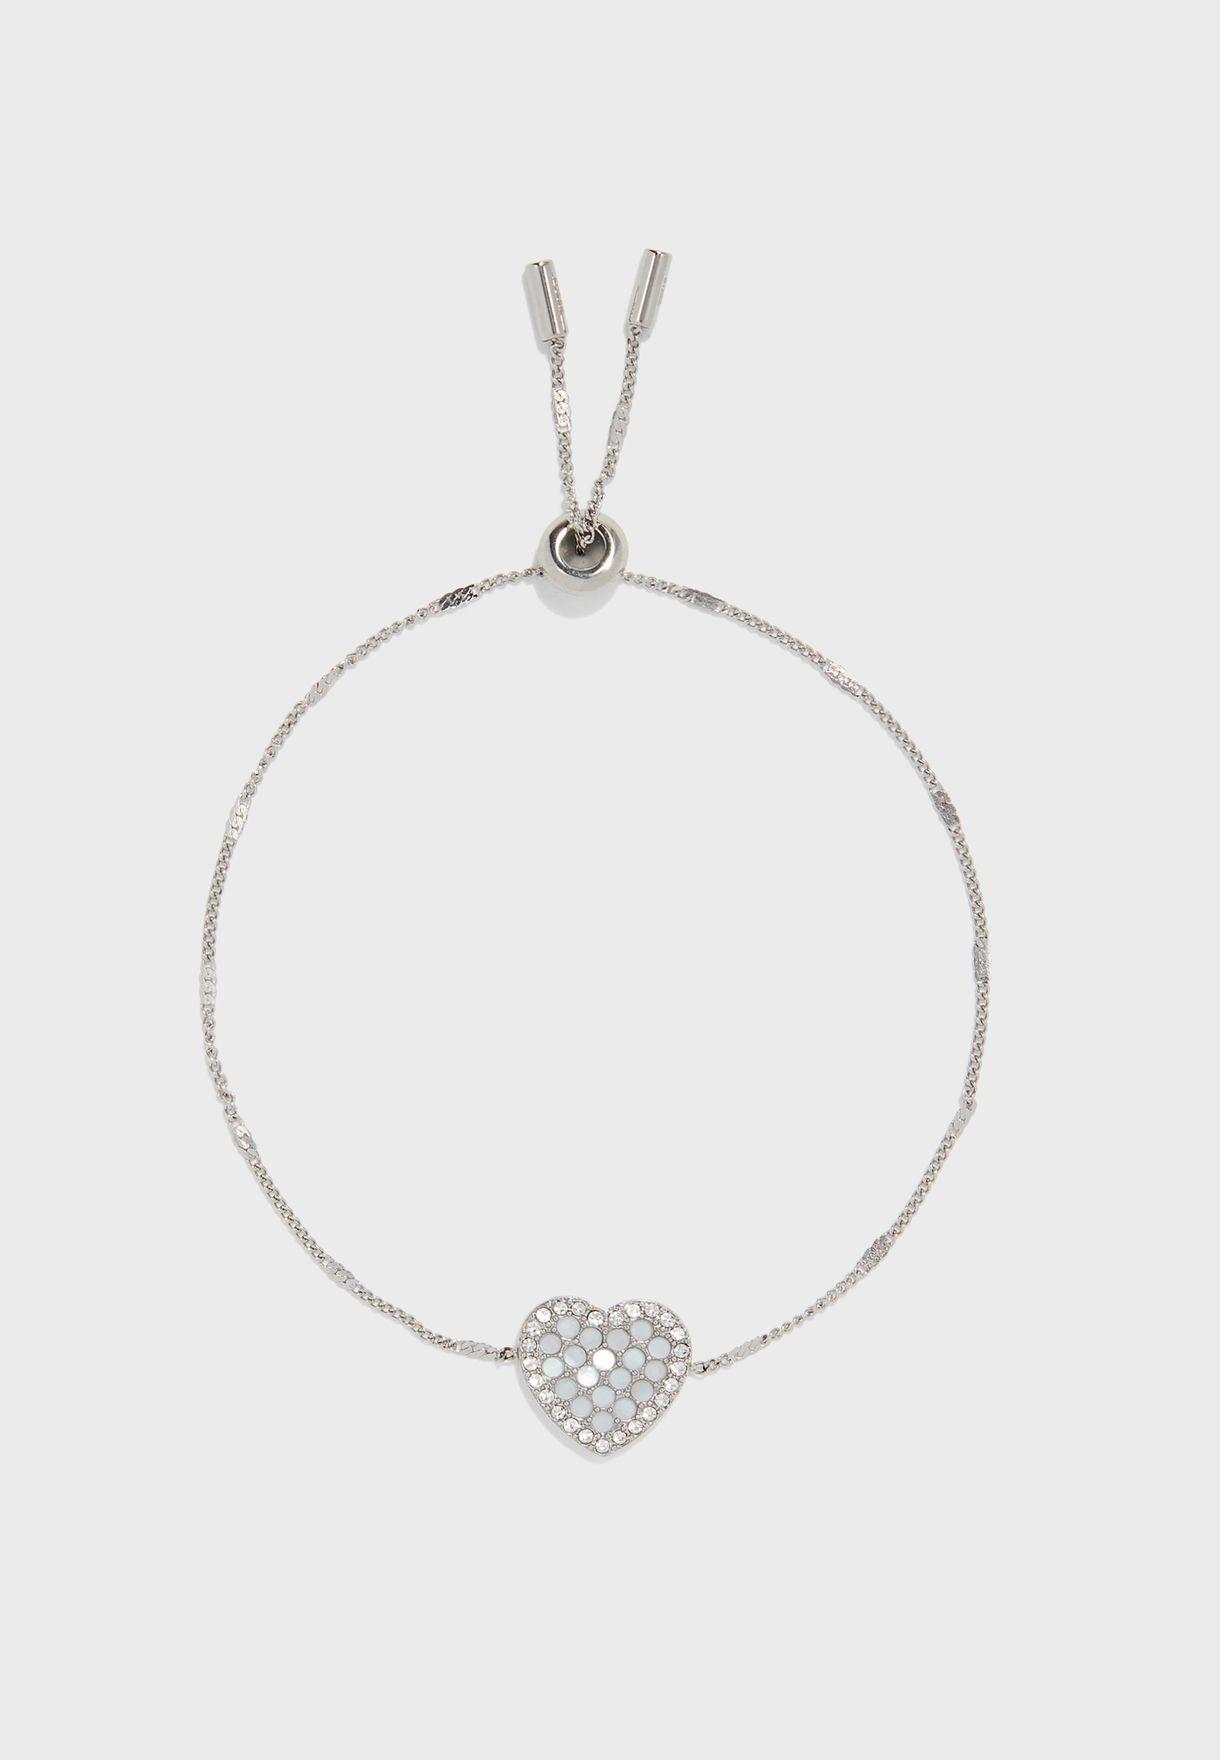 Studded Heart Bracelet